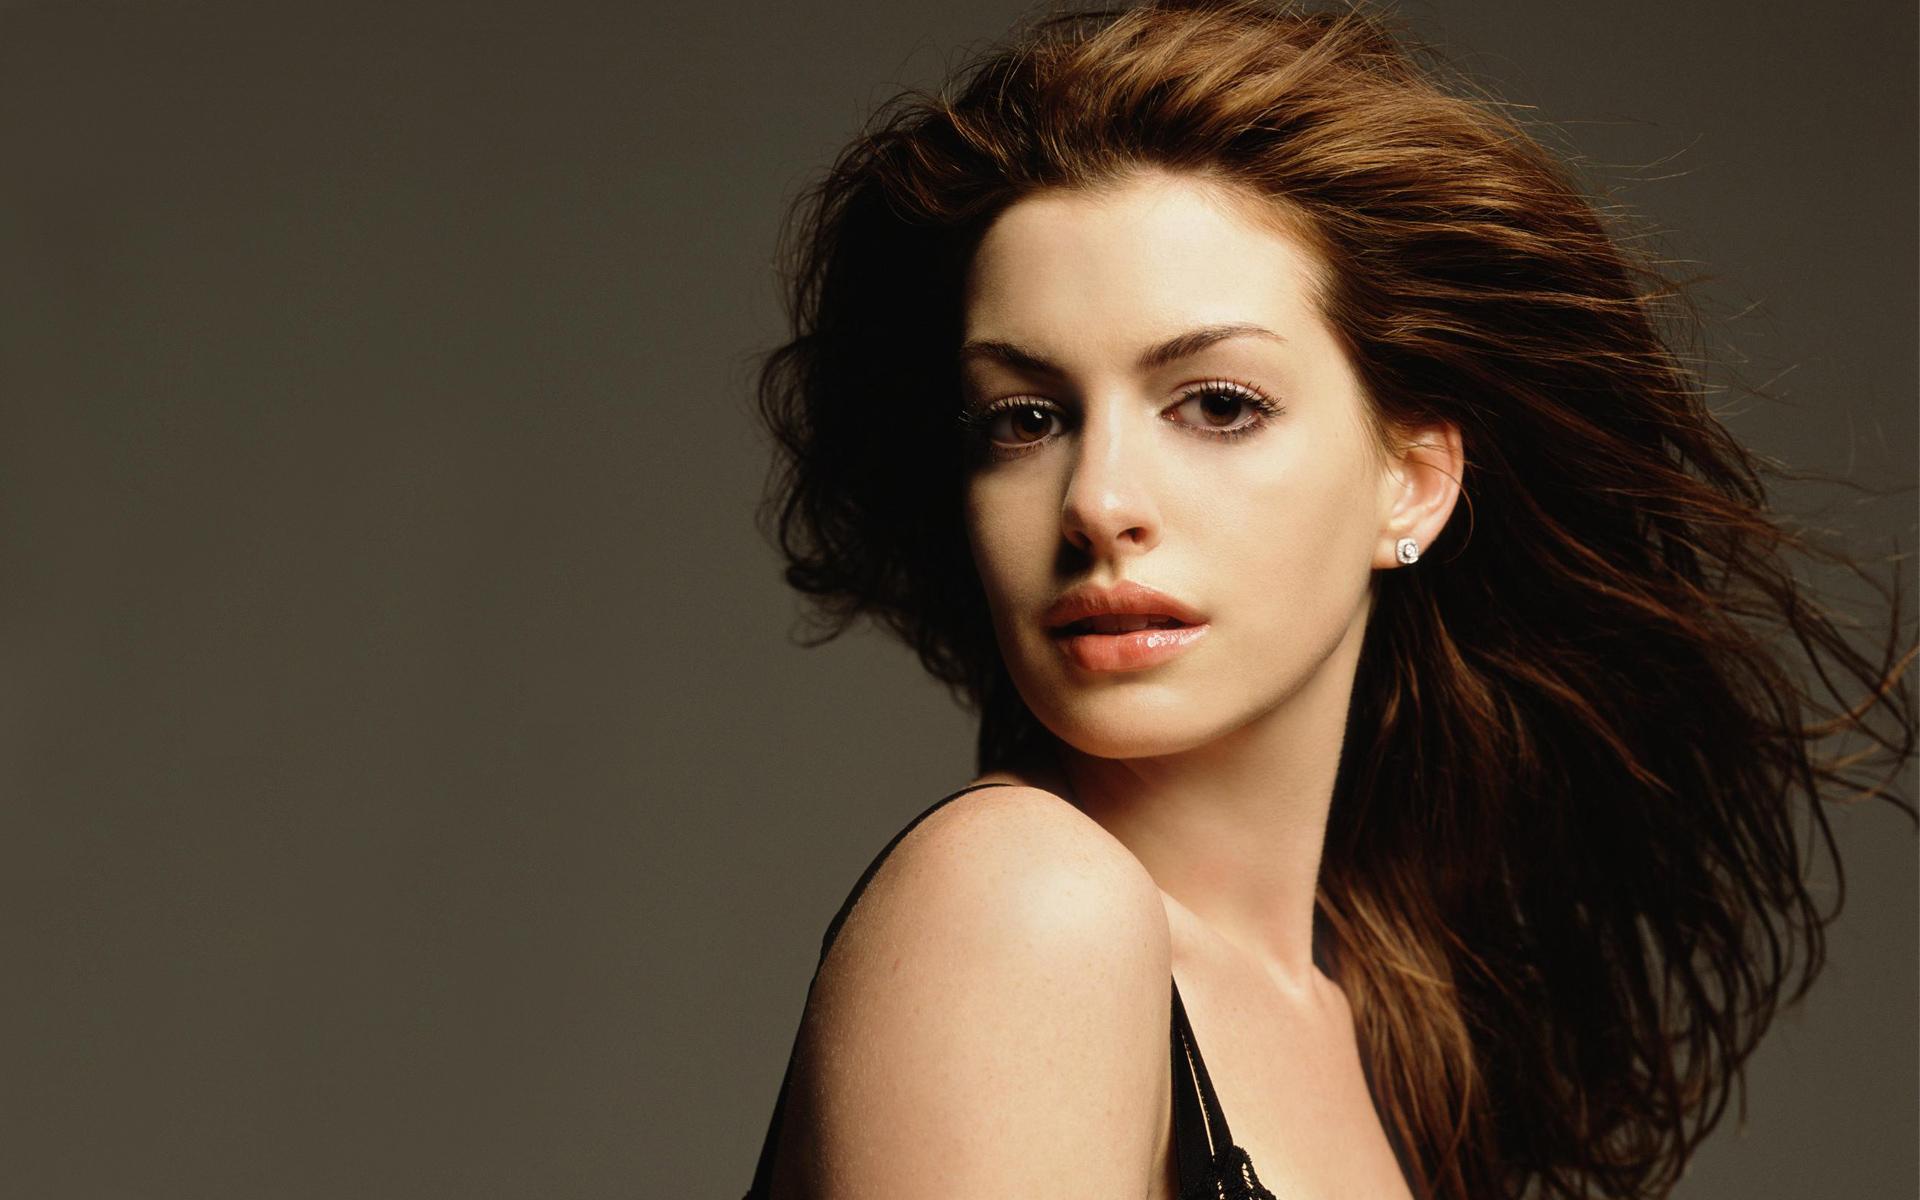 Anne Hathaway 27 wallpaper